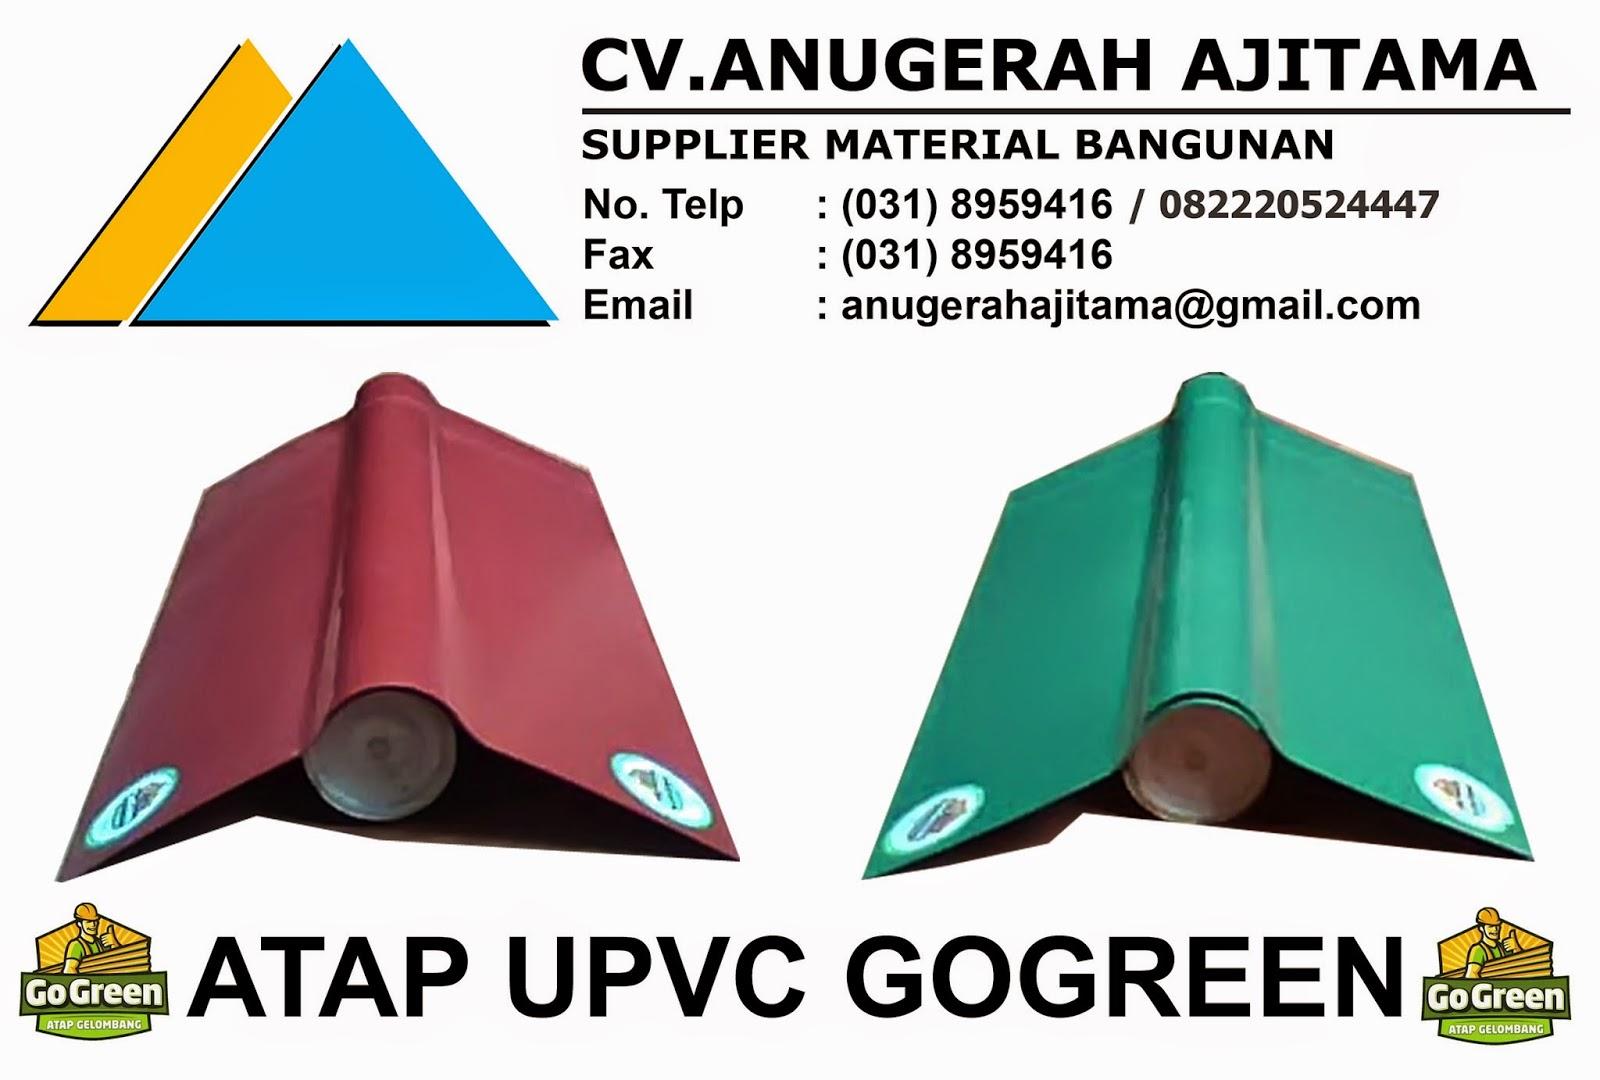 Ingin Keluarga Anda Sehat Ganti Atap Rumahmu Dengan Atap Gogreen Cv Anugerah Ajitama Seng plastik go green